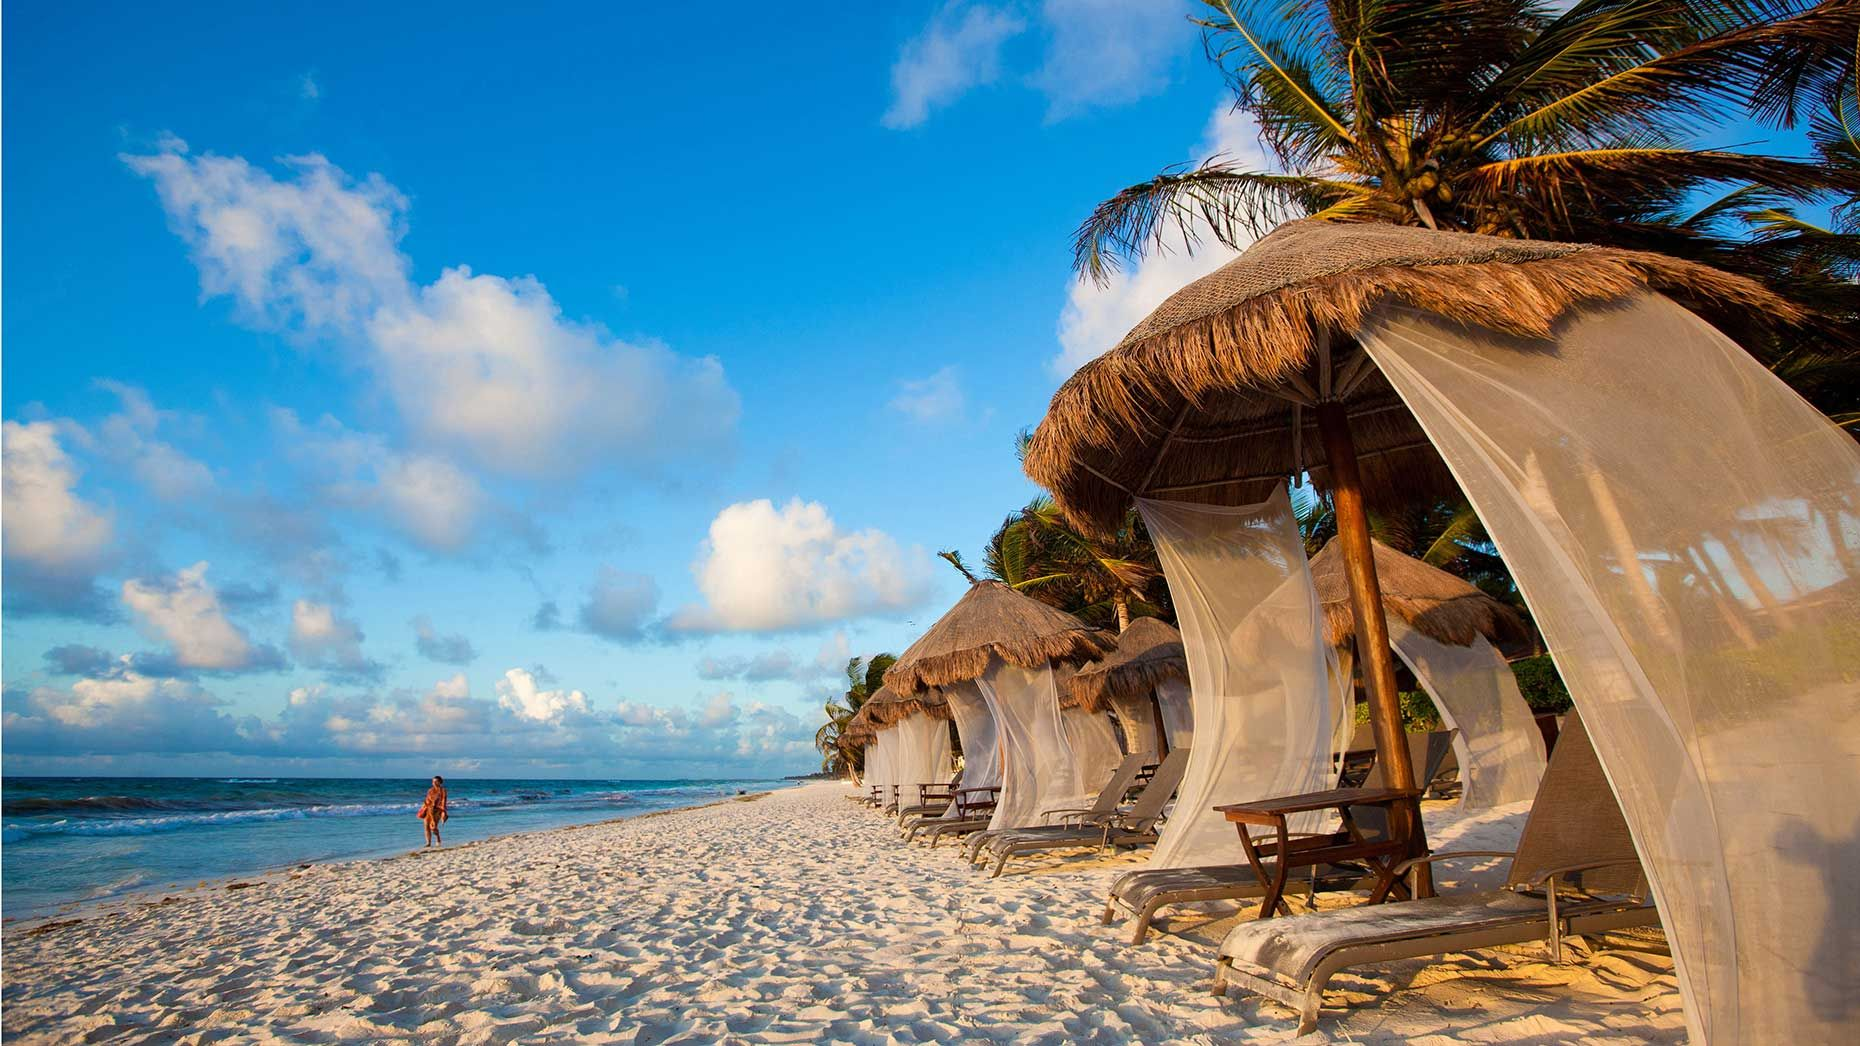 Hawaii vs. Mexico: Two destinations, one sun